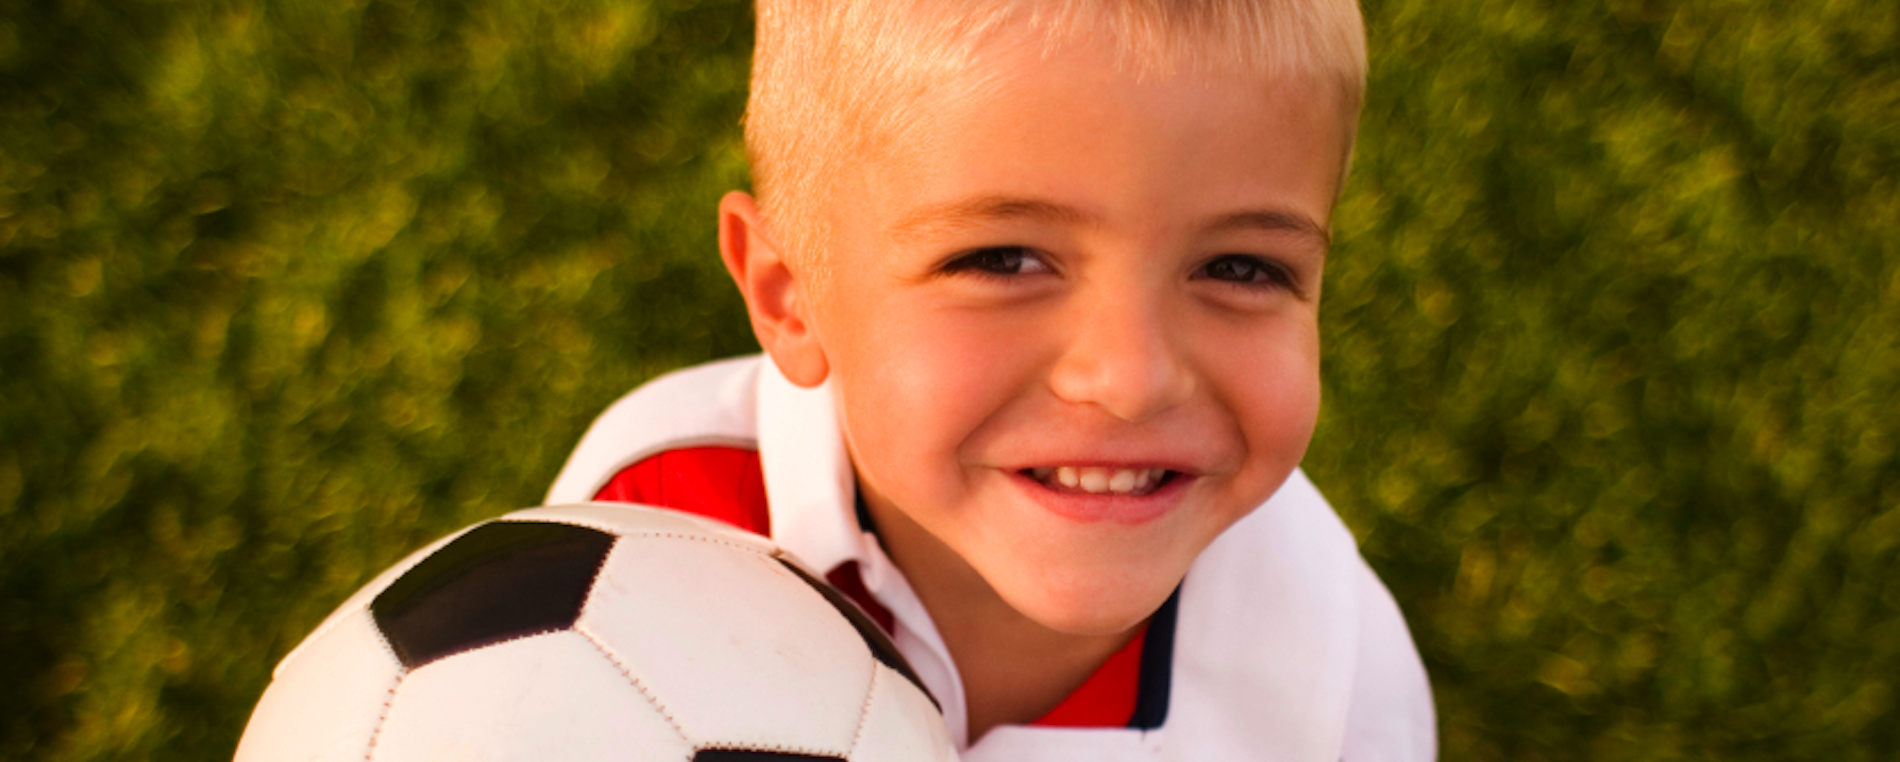 Sports FUNdamentals Soccer